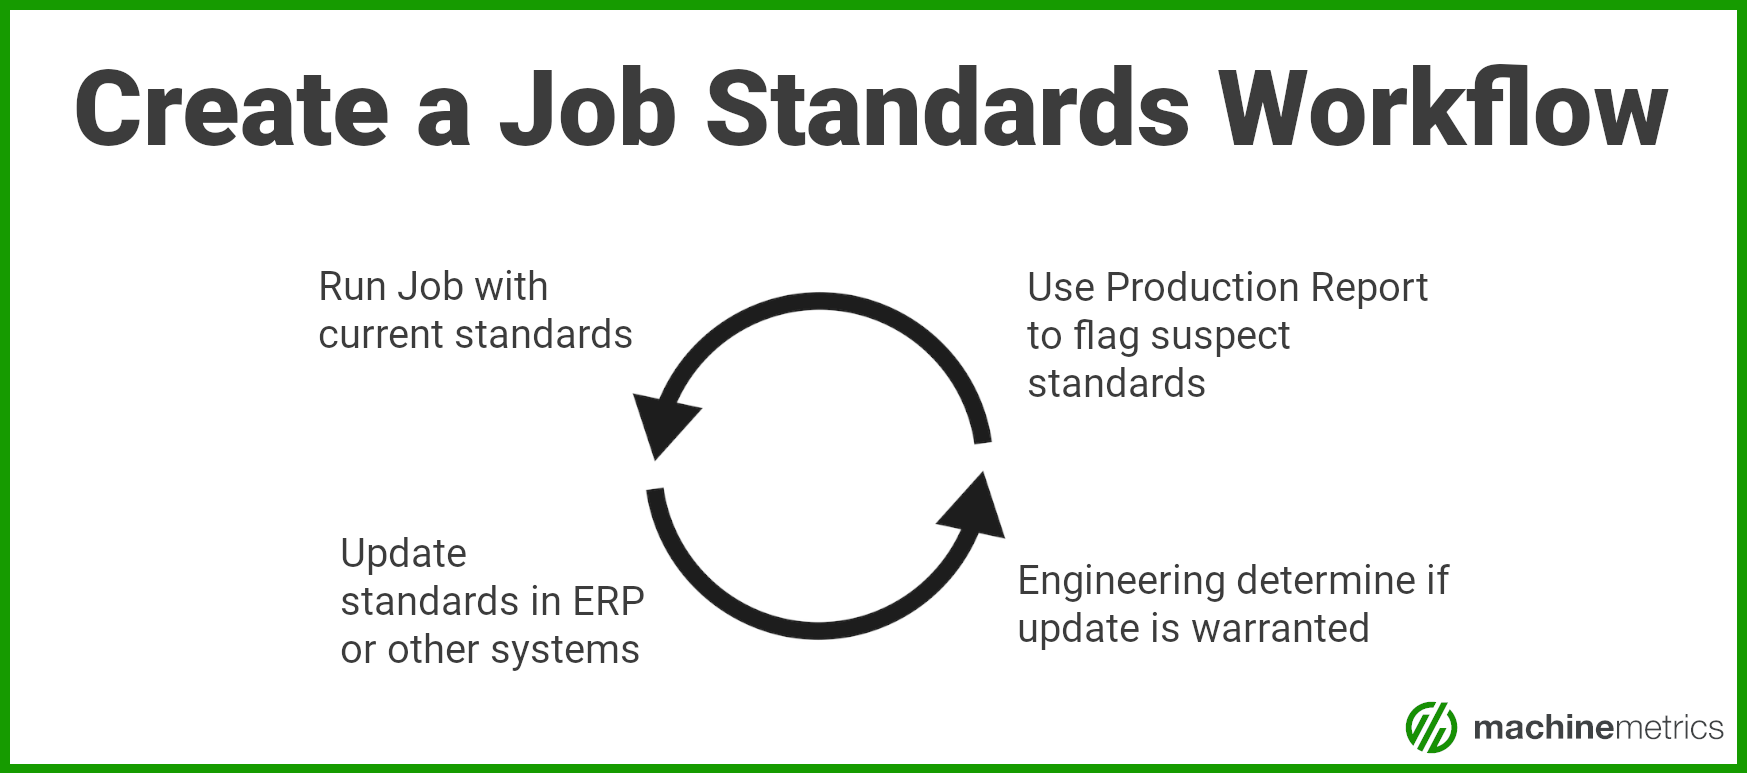 Create a Job Standards Workflow with MachineMetrics